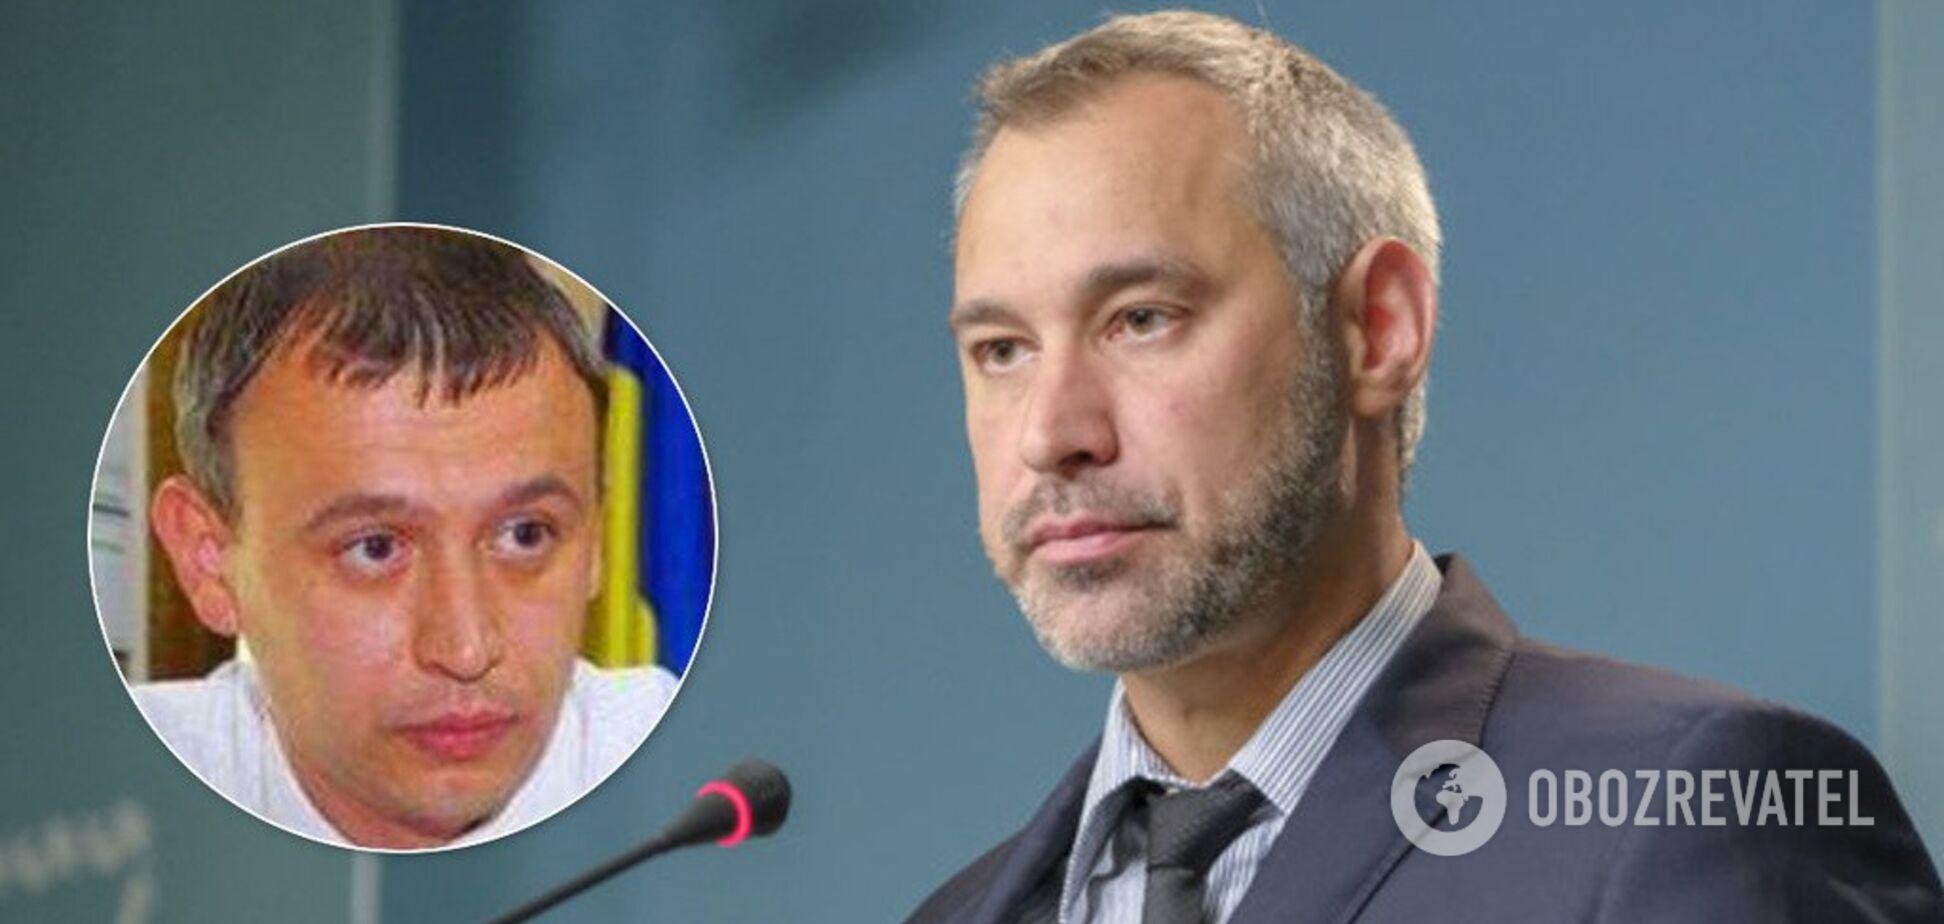 Рябошапка звільнив прокурора Києва, призначеного Луценком